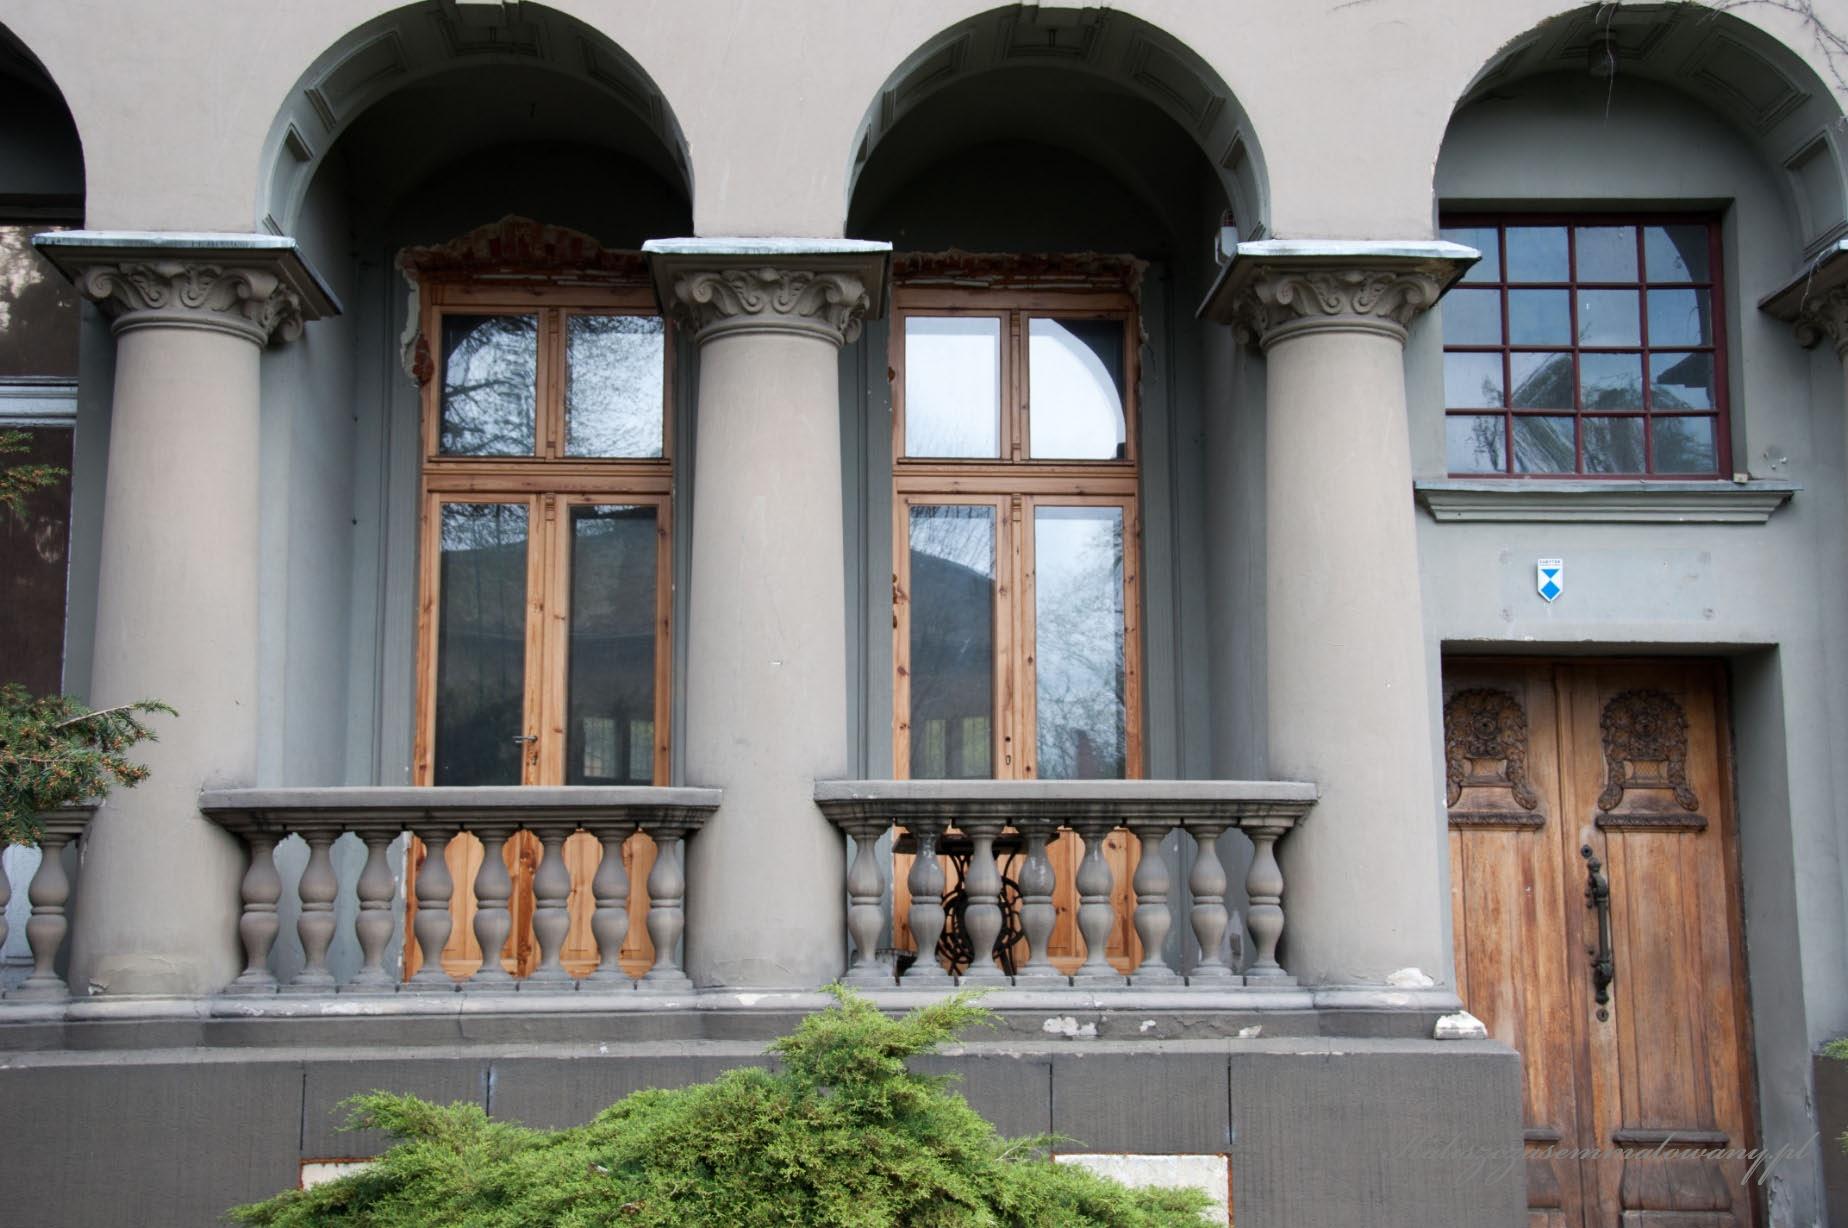 Dom_pod_anilolami-04